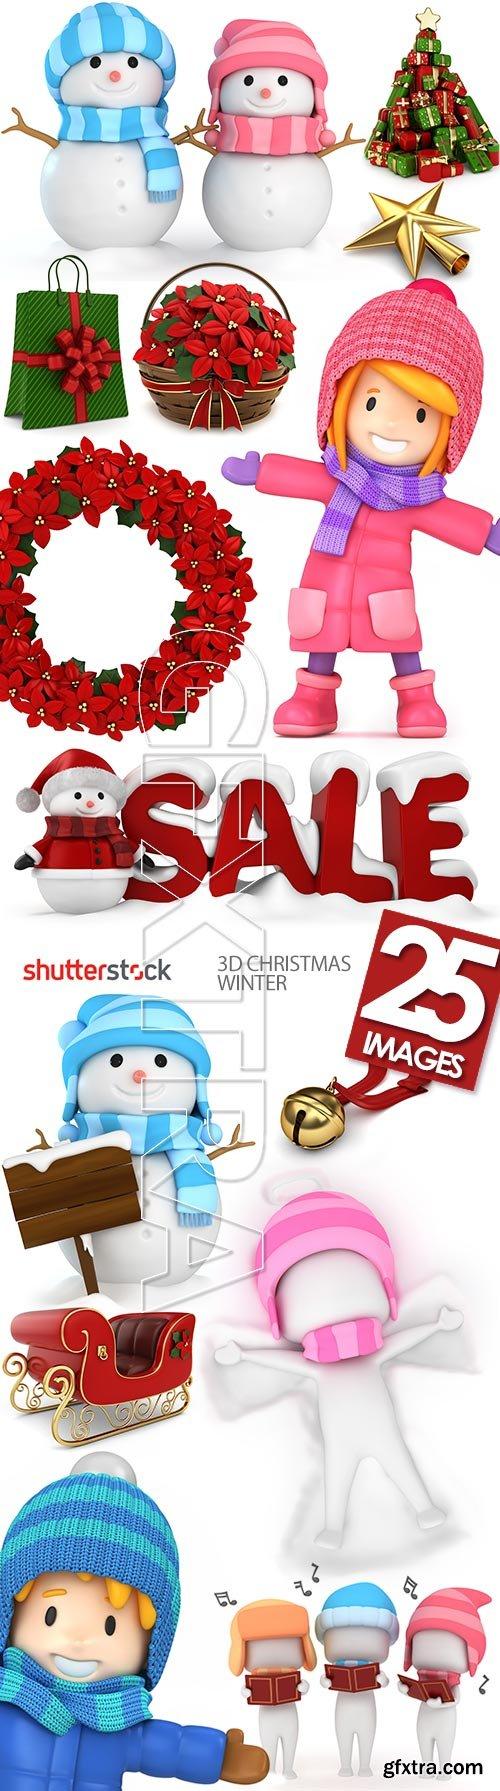 3D Christmas Winter 25xJPG